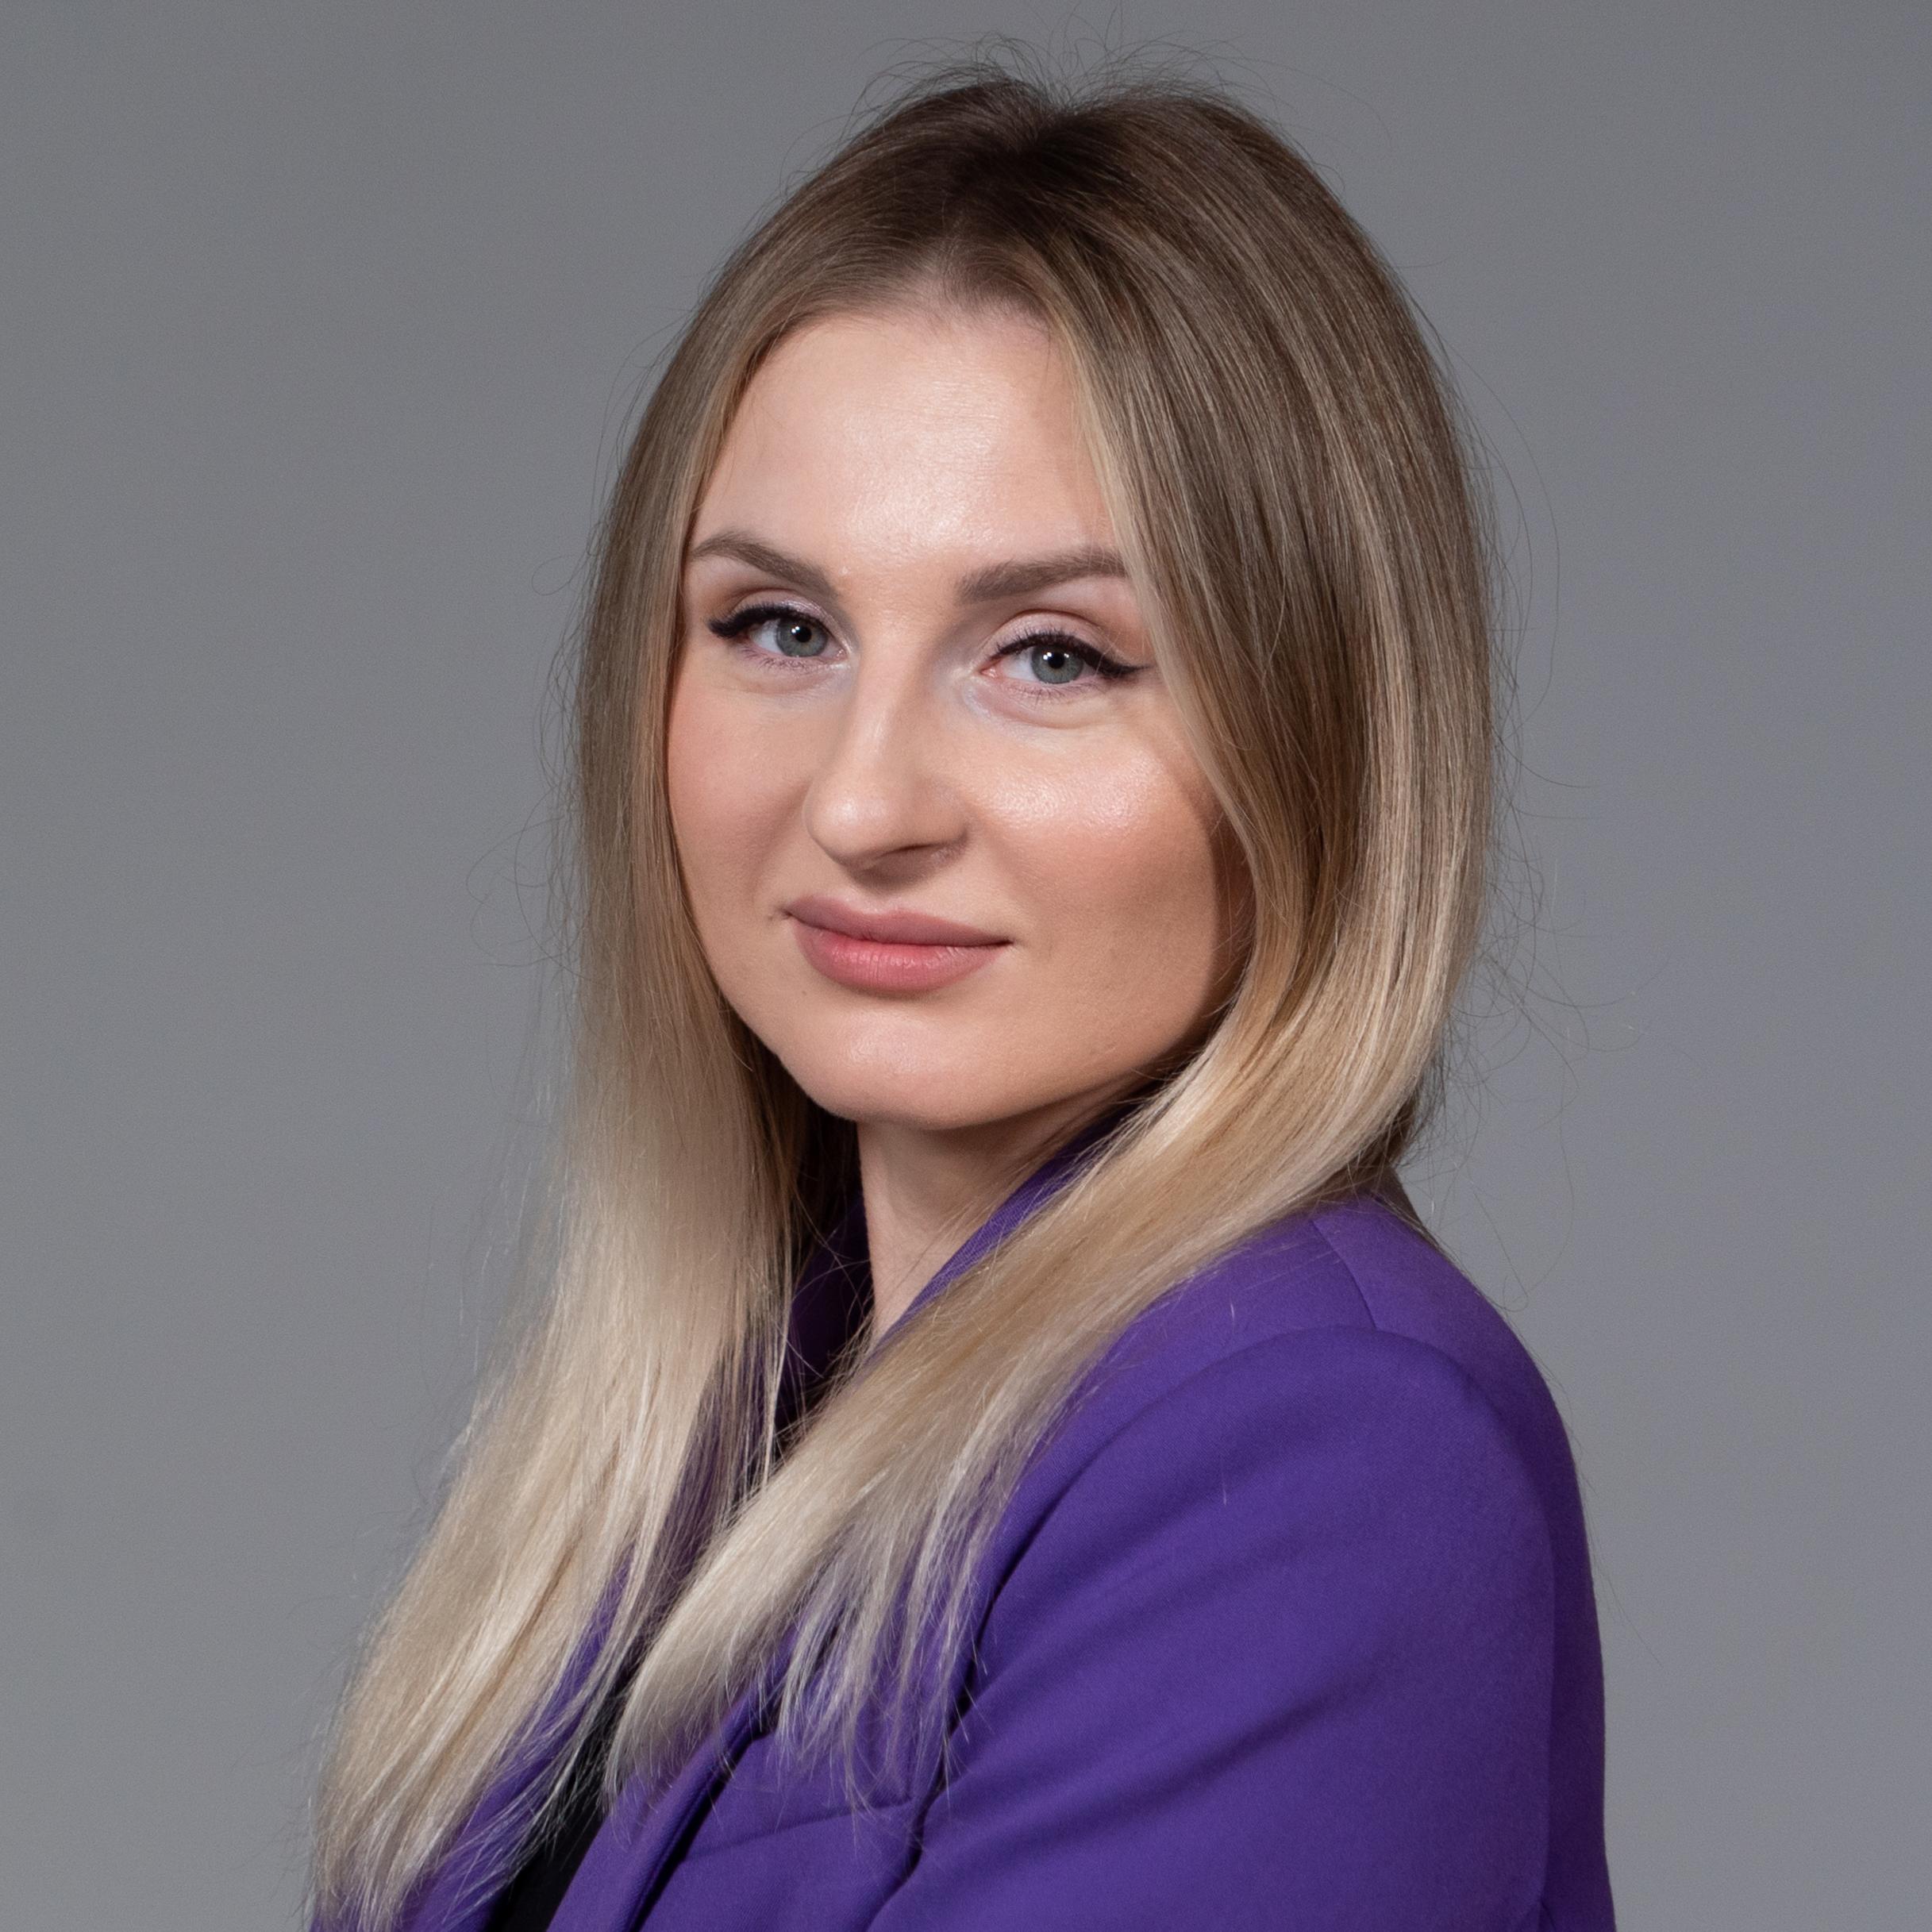 Любеева Светлана Васильевна